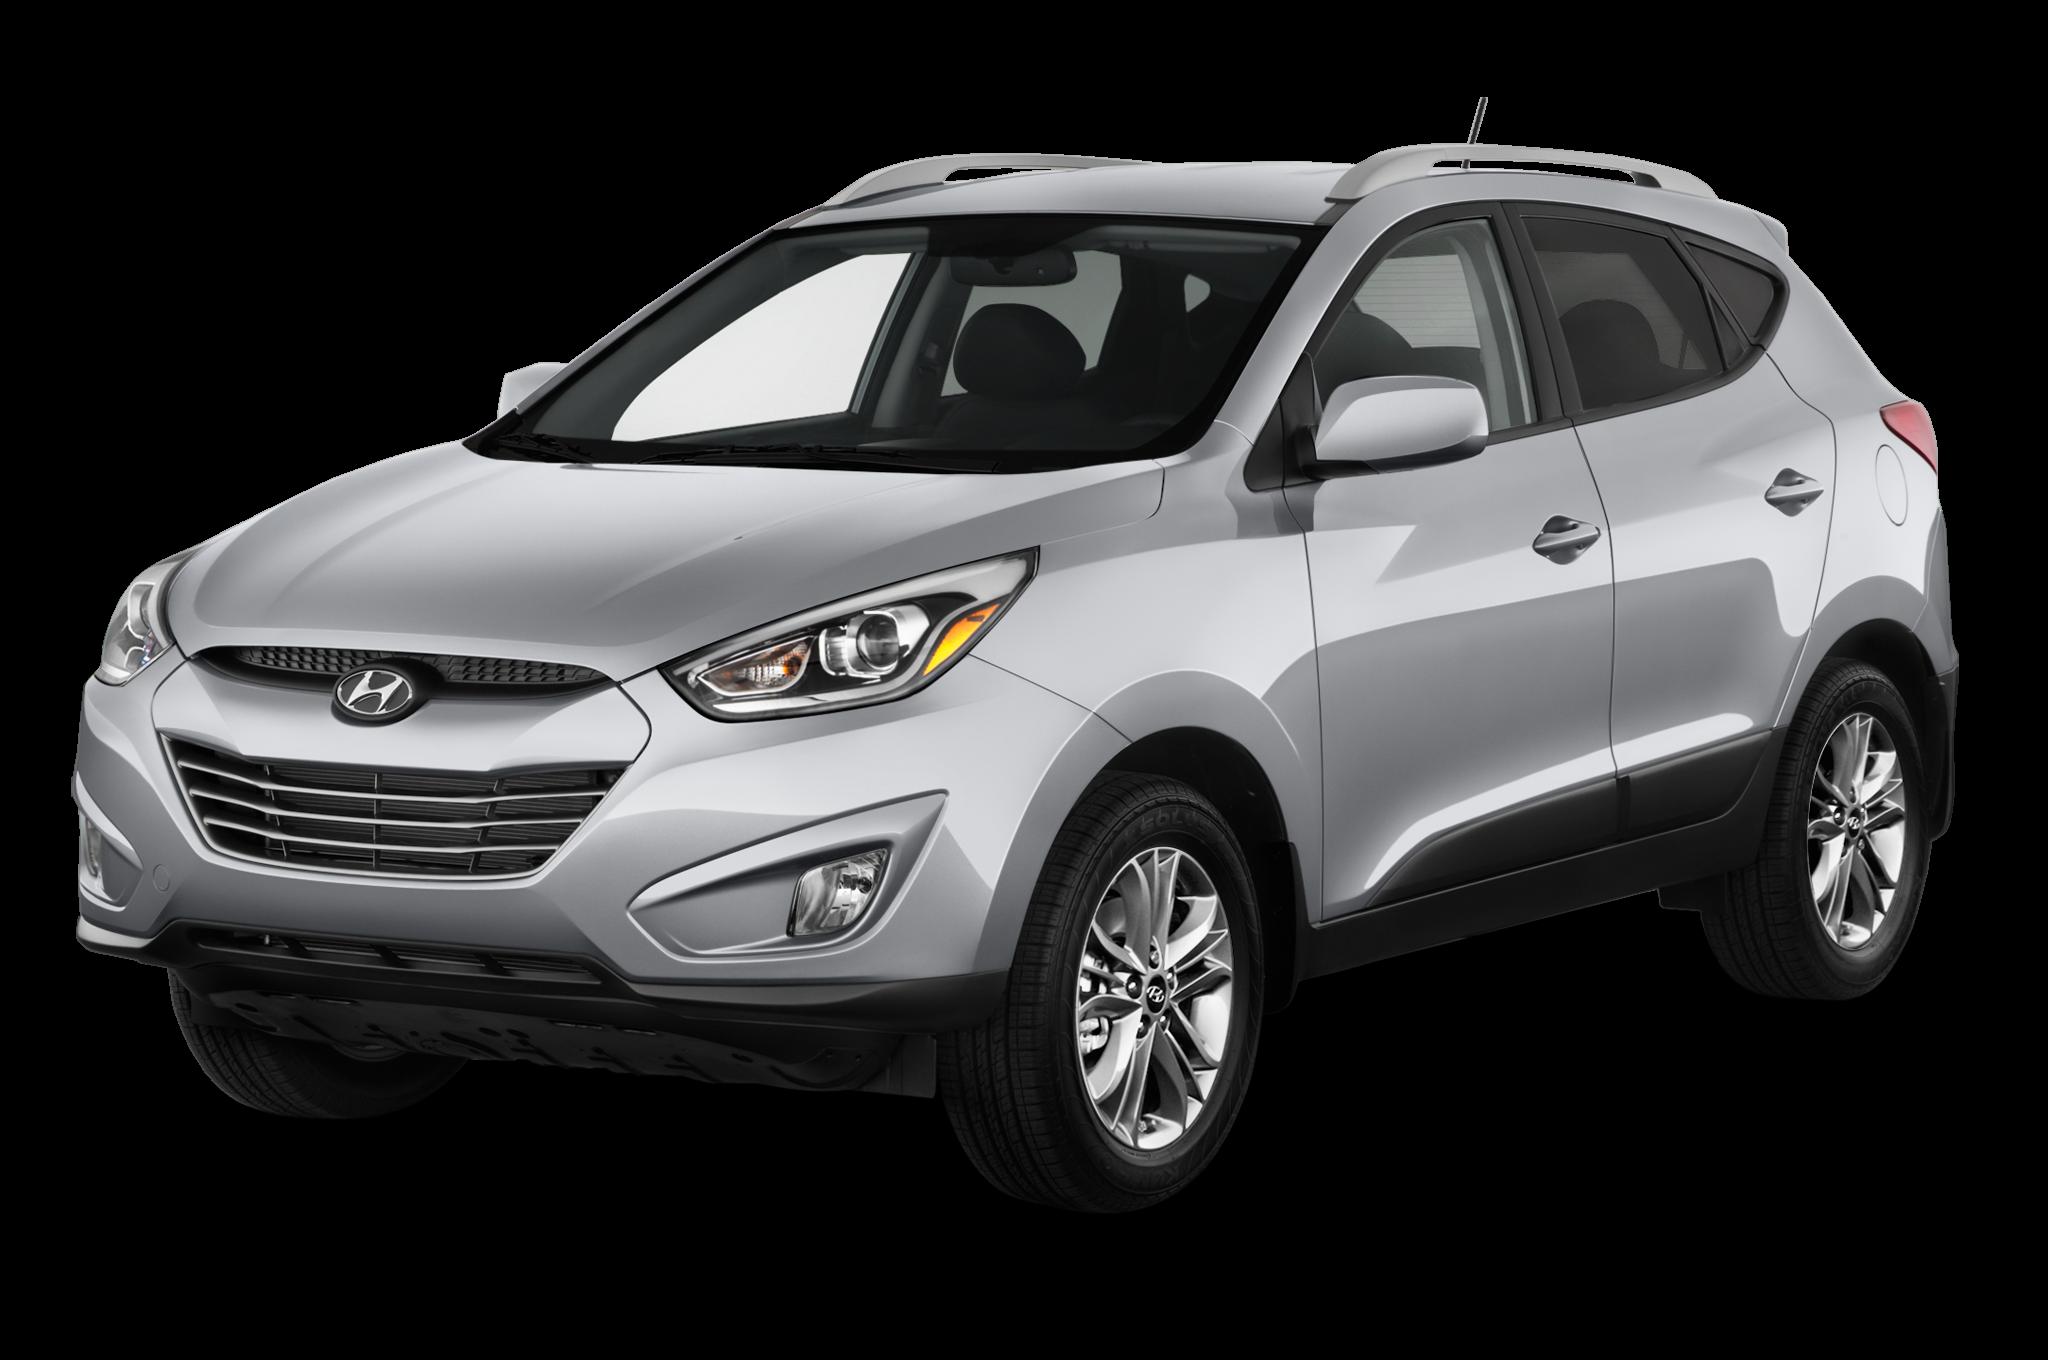 hyundai expert new tucson car test review buy drive